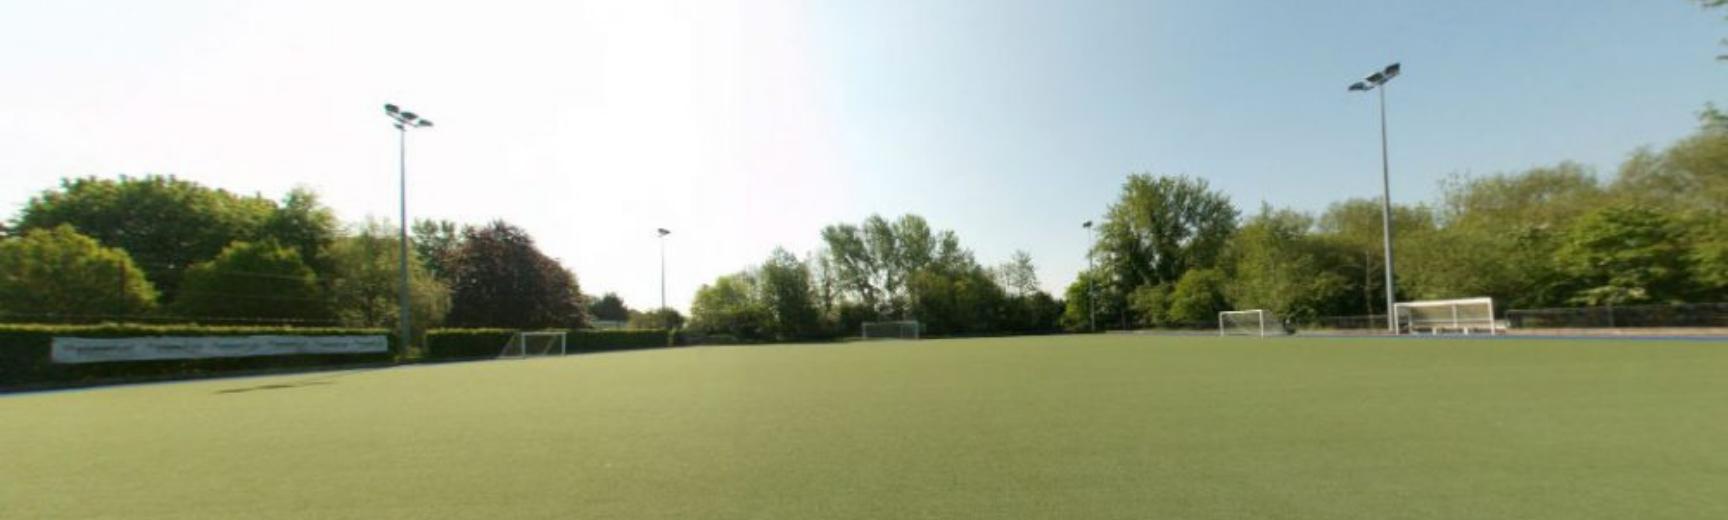 hockey pitch